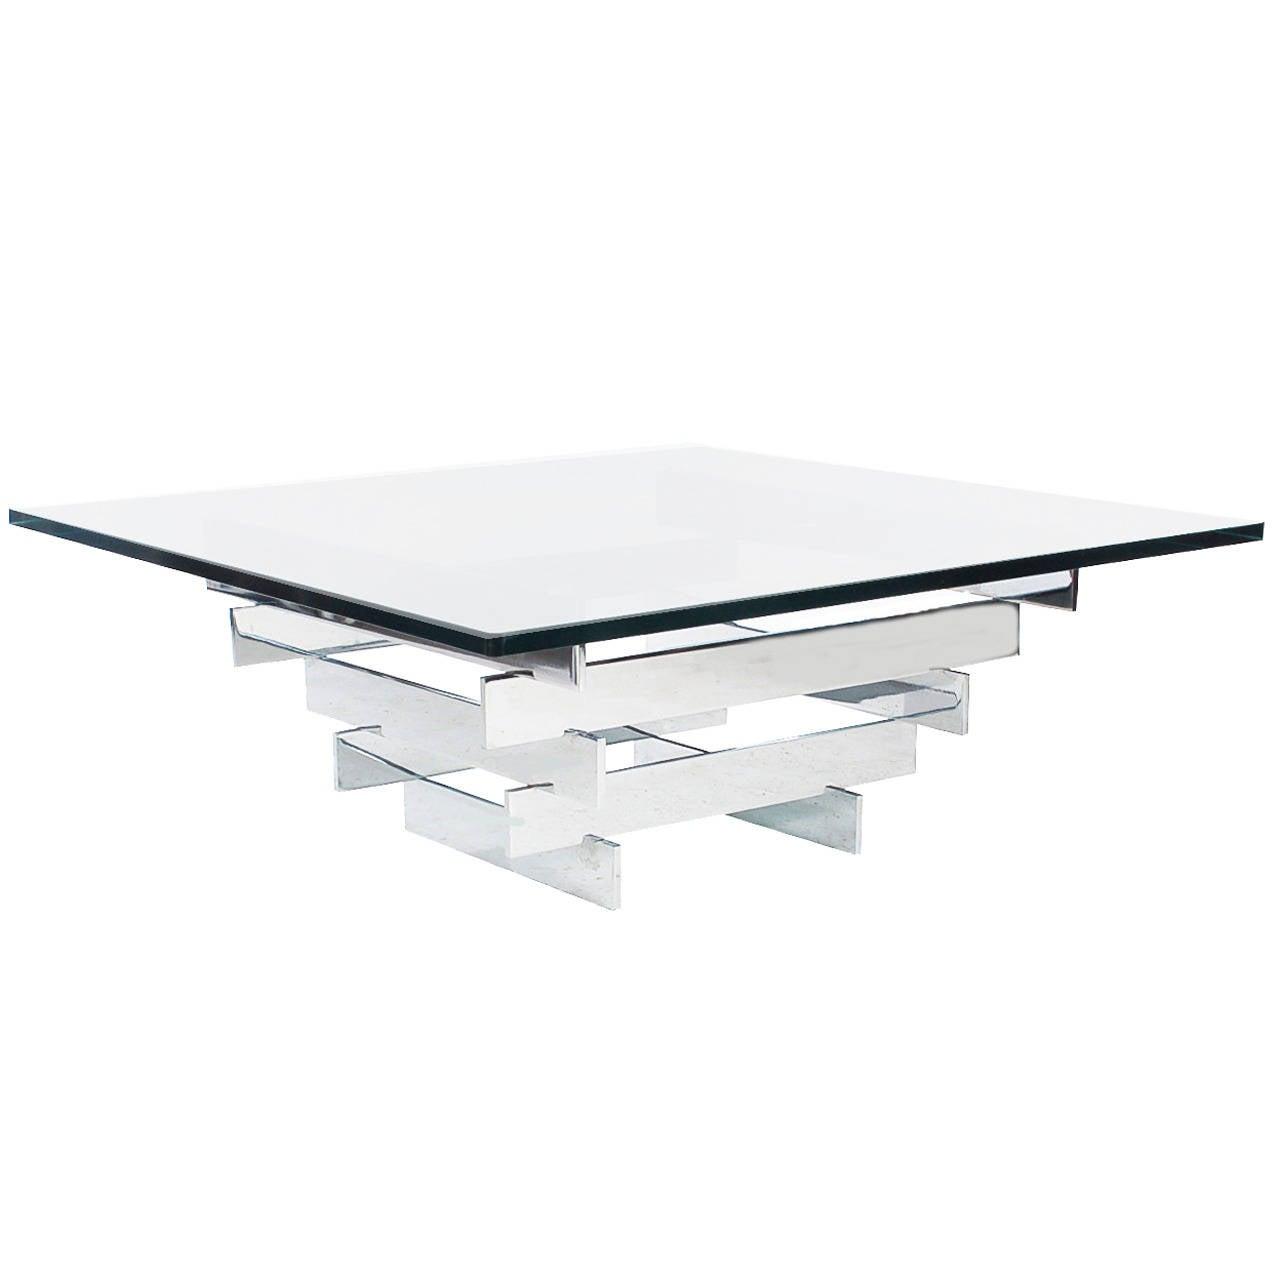 paul mayen for habitat chrome and glass coffee table at stdibs - paul mayen for habitat chrome and glass coffee table